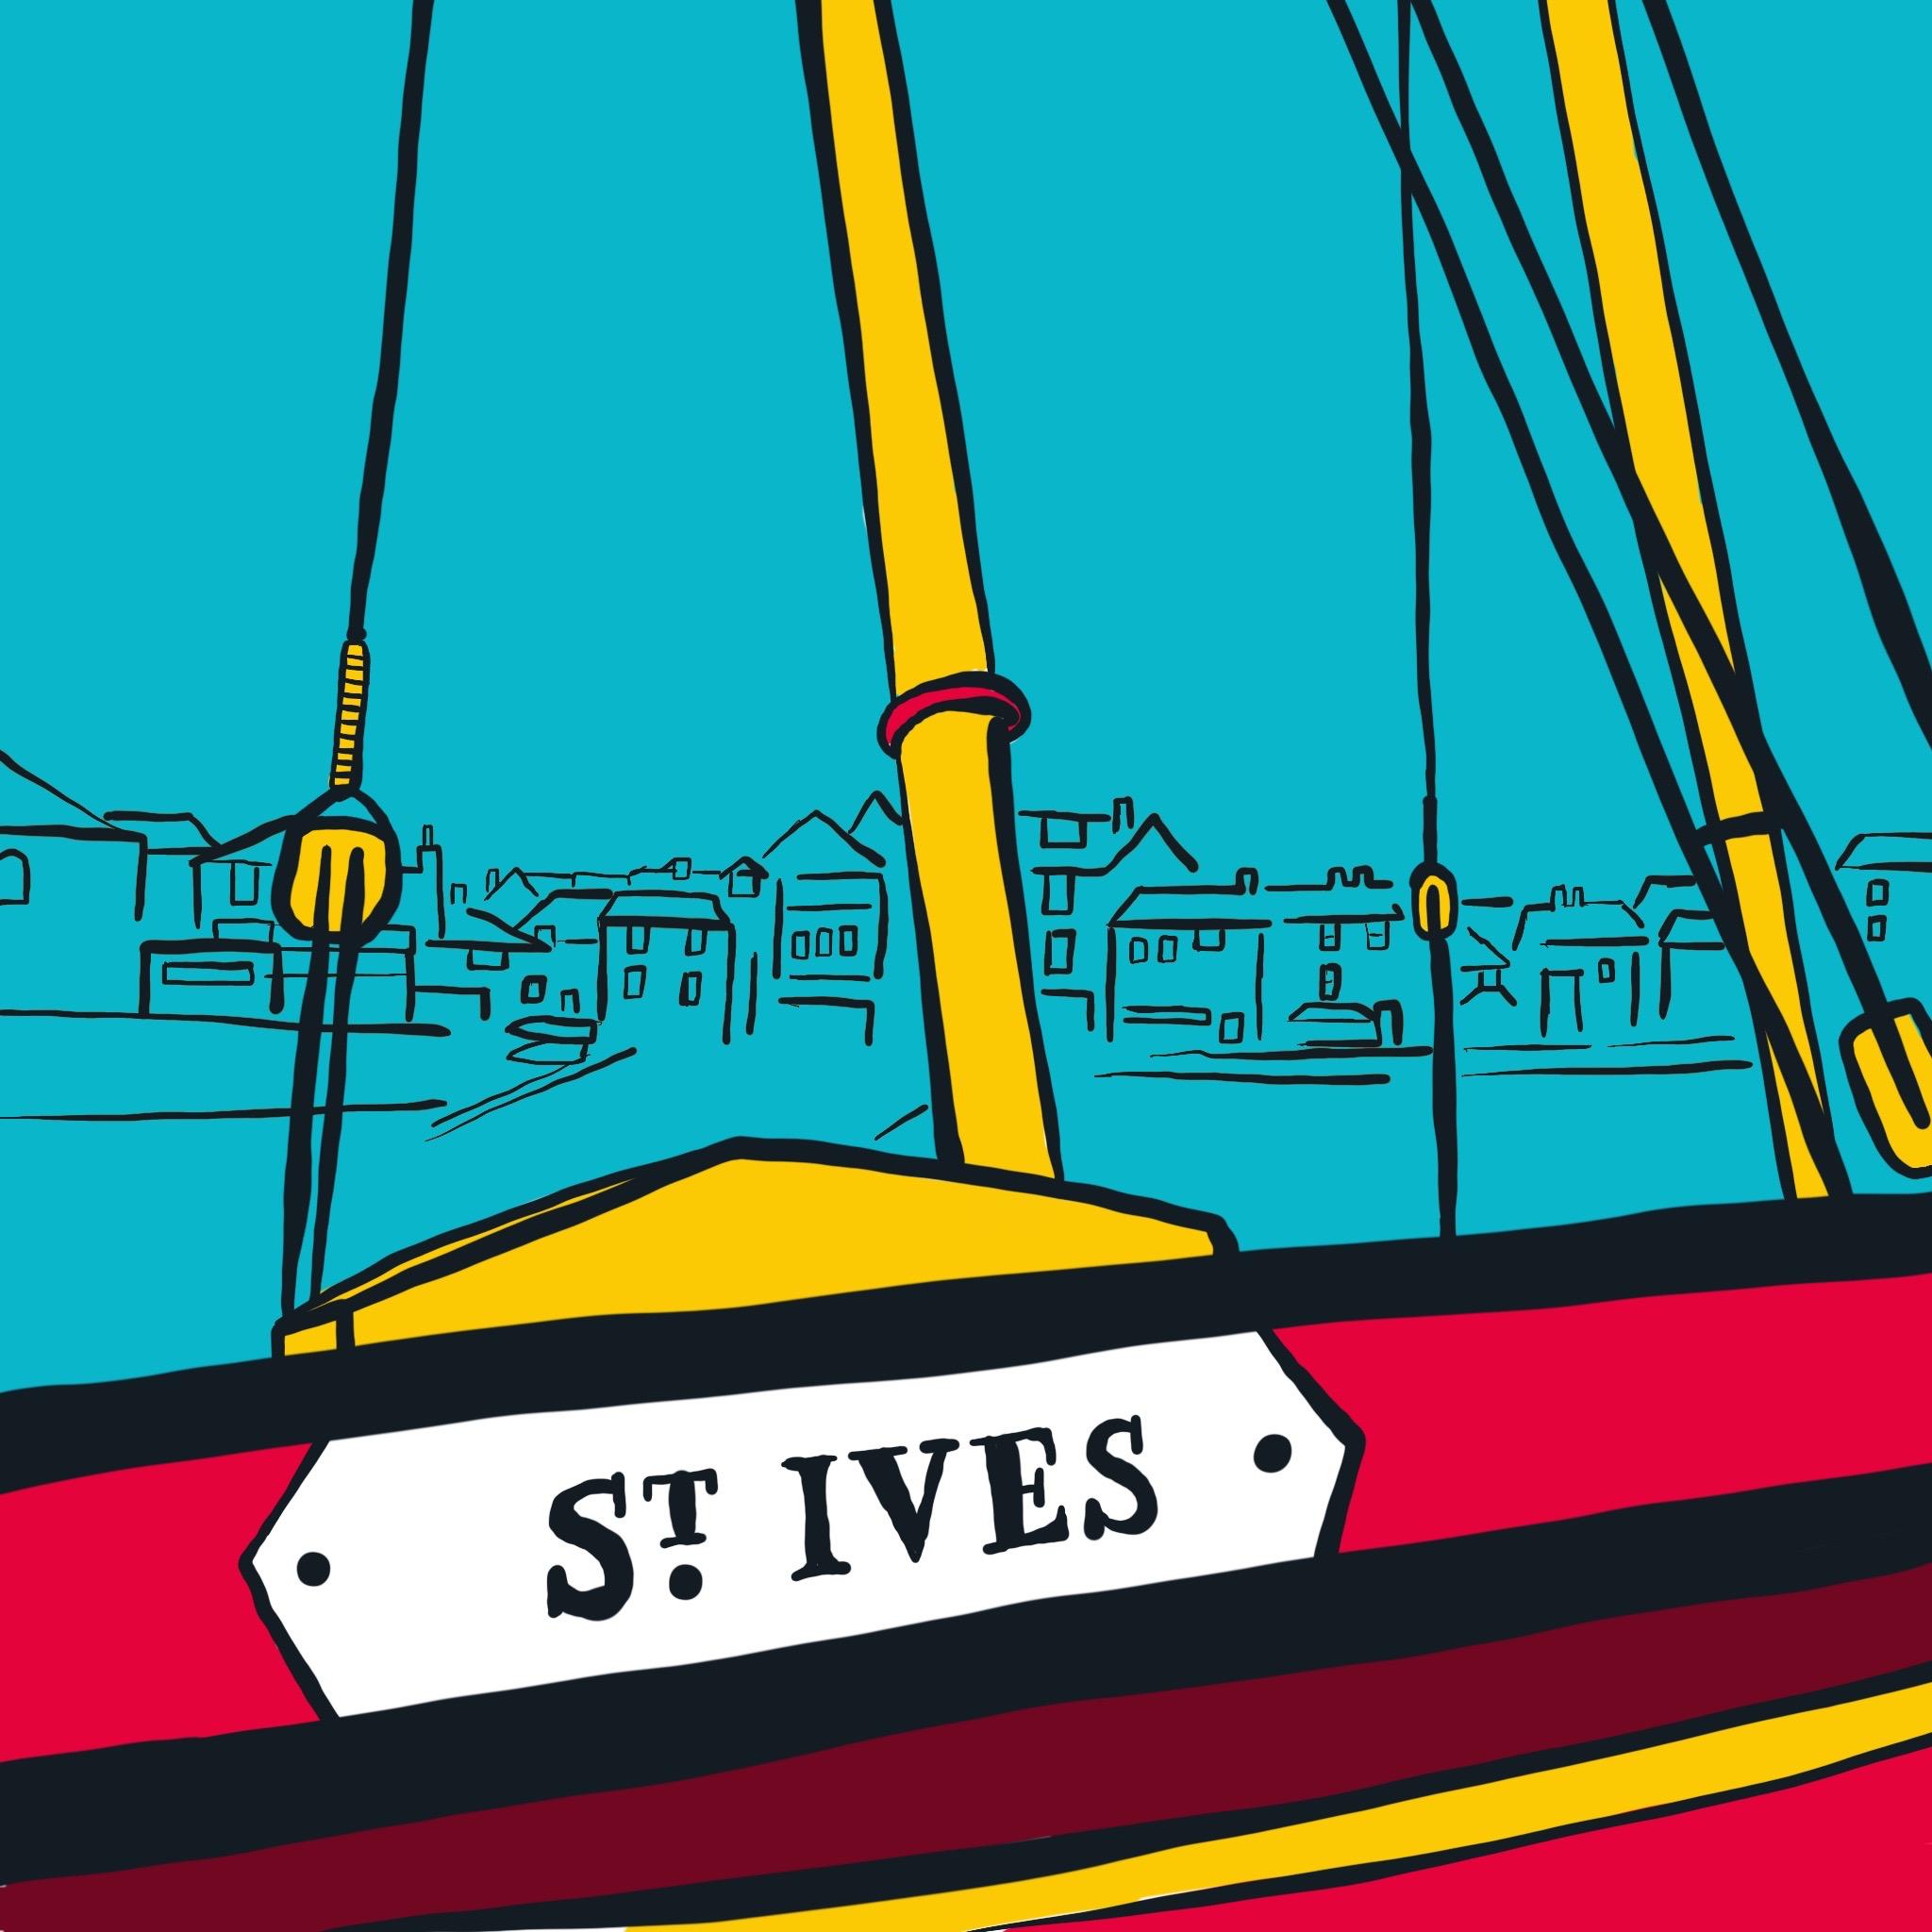 St Ives illustrations